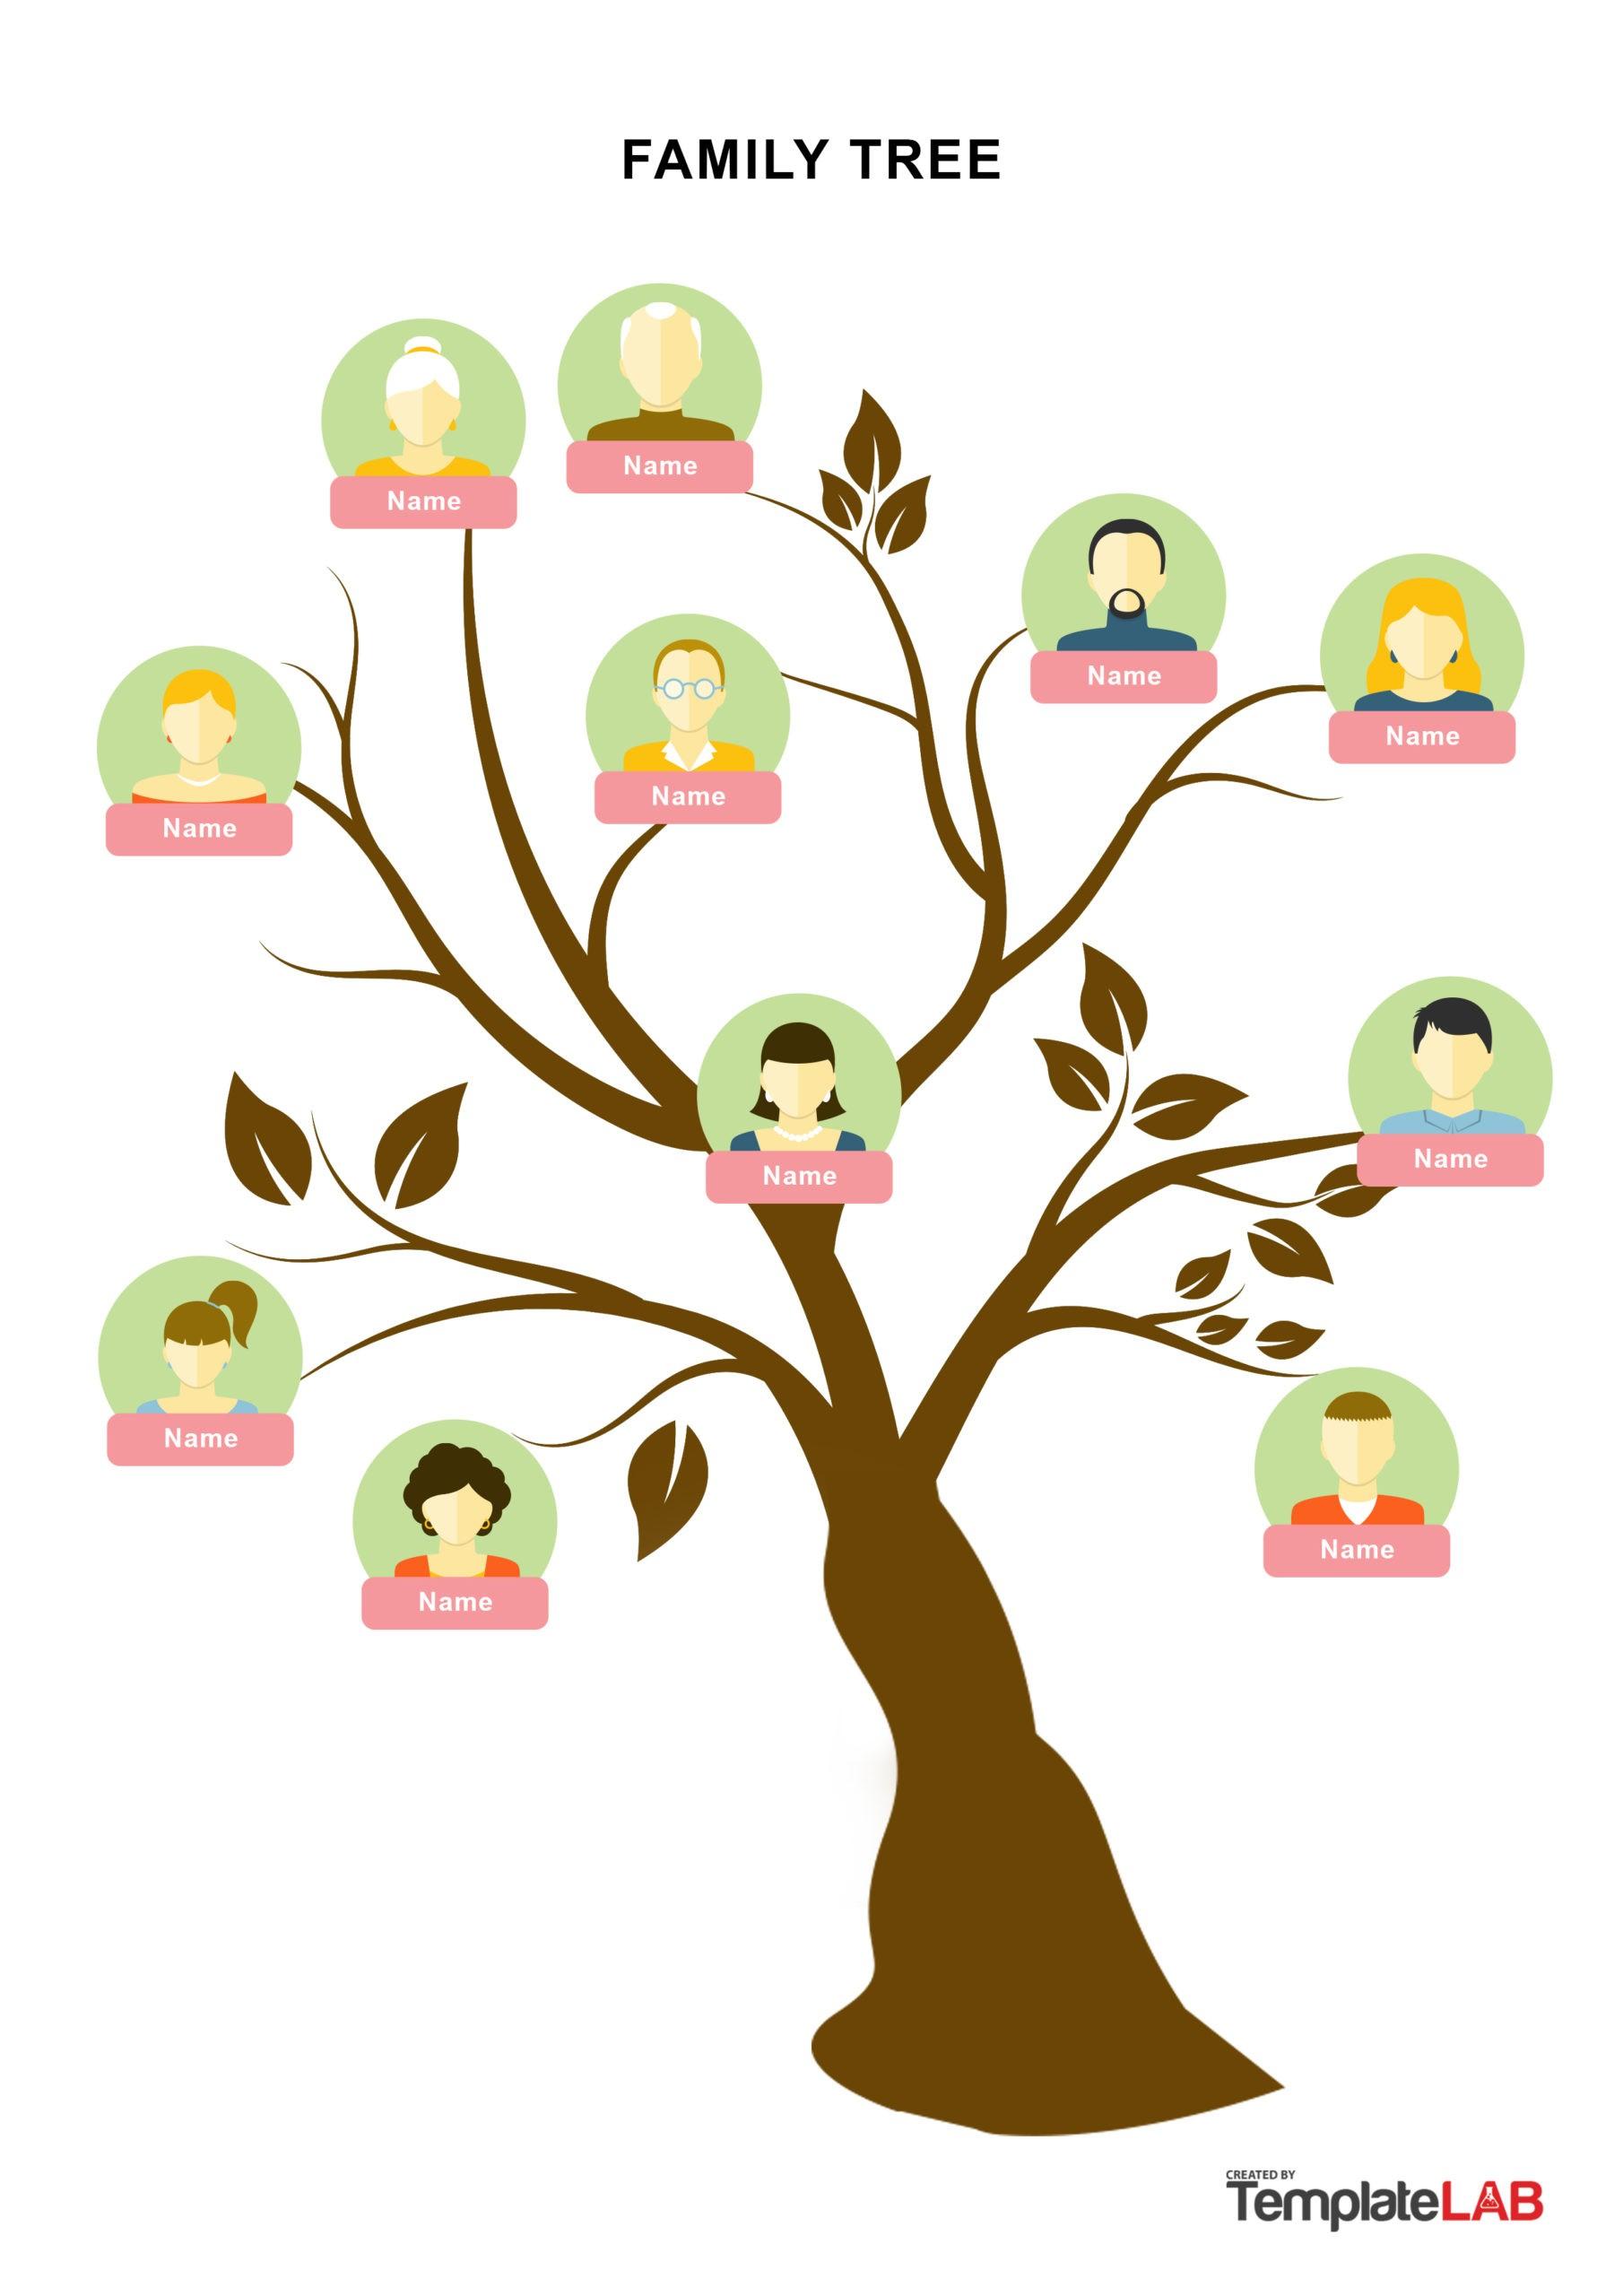 Free Family Tree Template 19 - TemplateLab.com